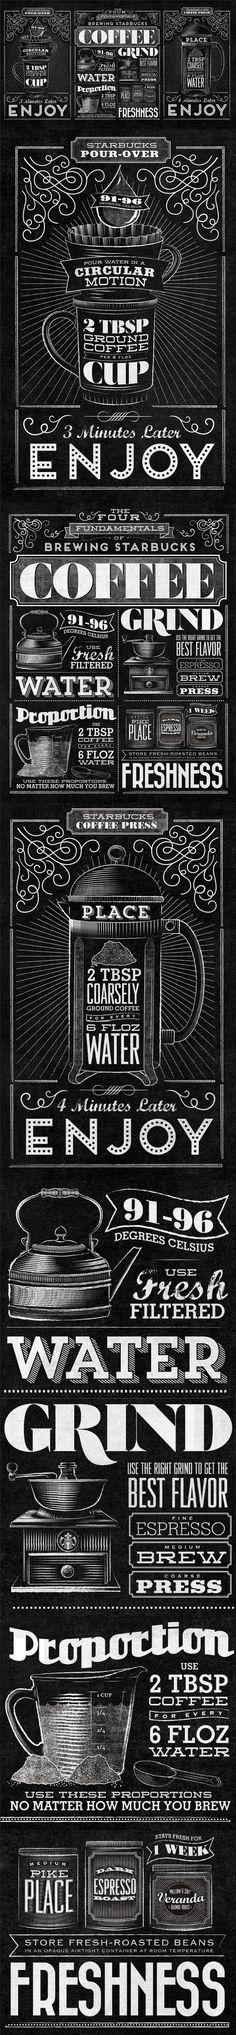 http://www.behance.net/gallery/Starbucks-Home-Brew/7638293